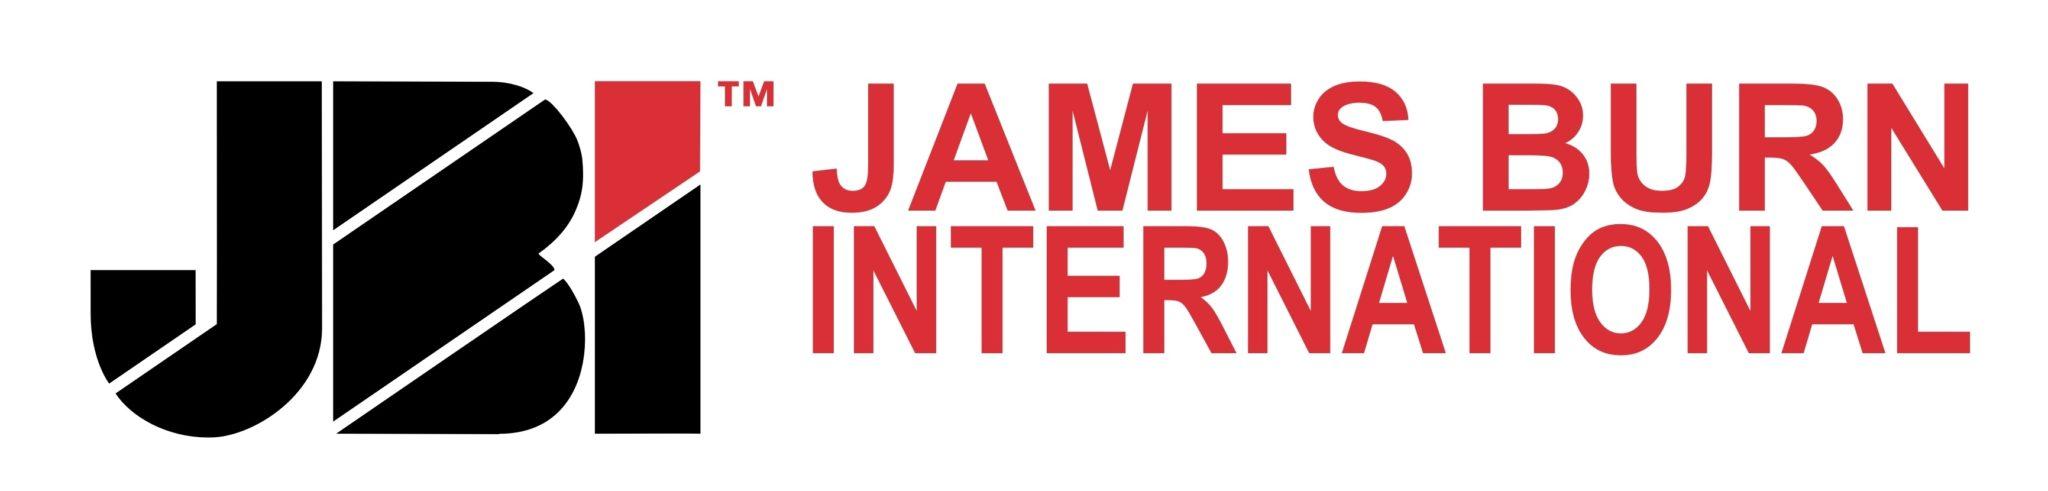 JBI - James Burn Int. logo